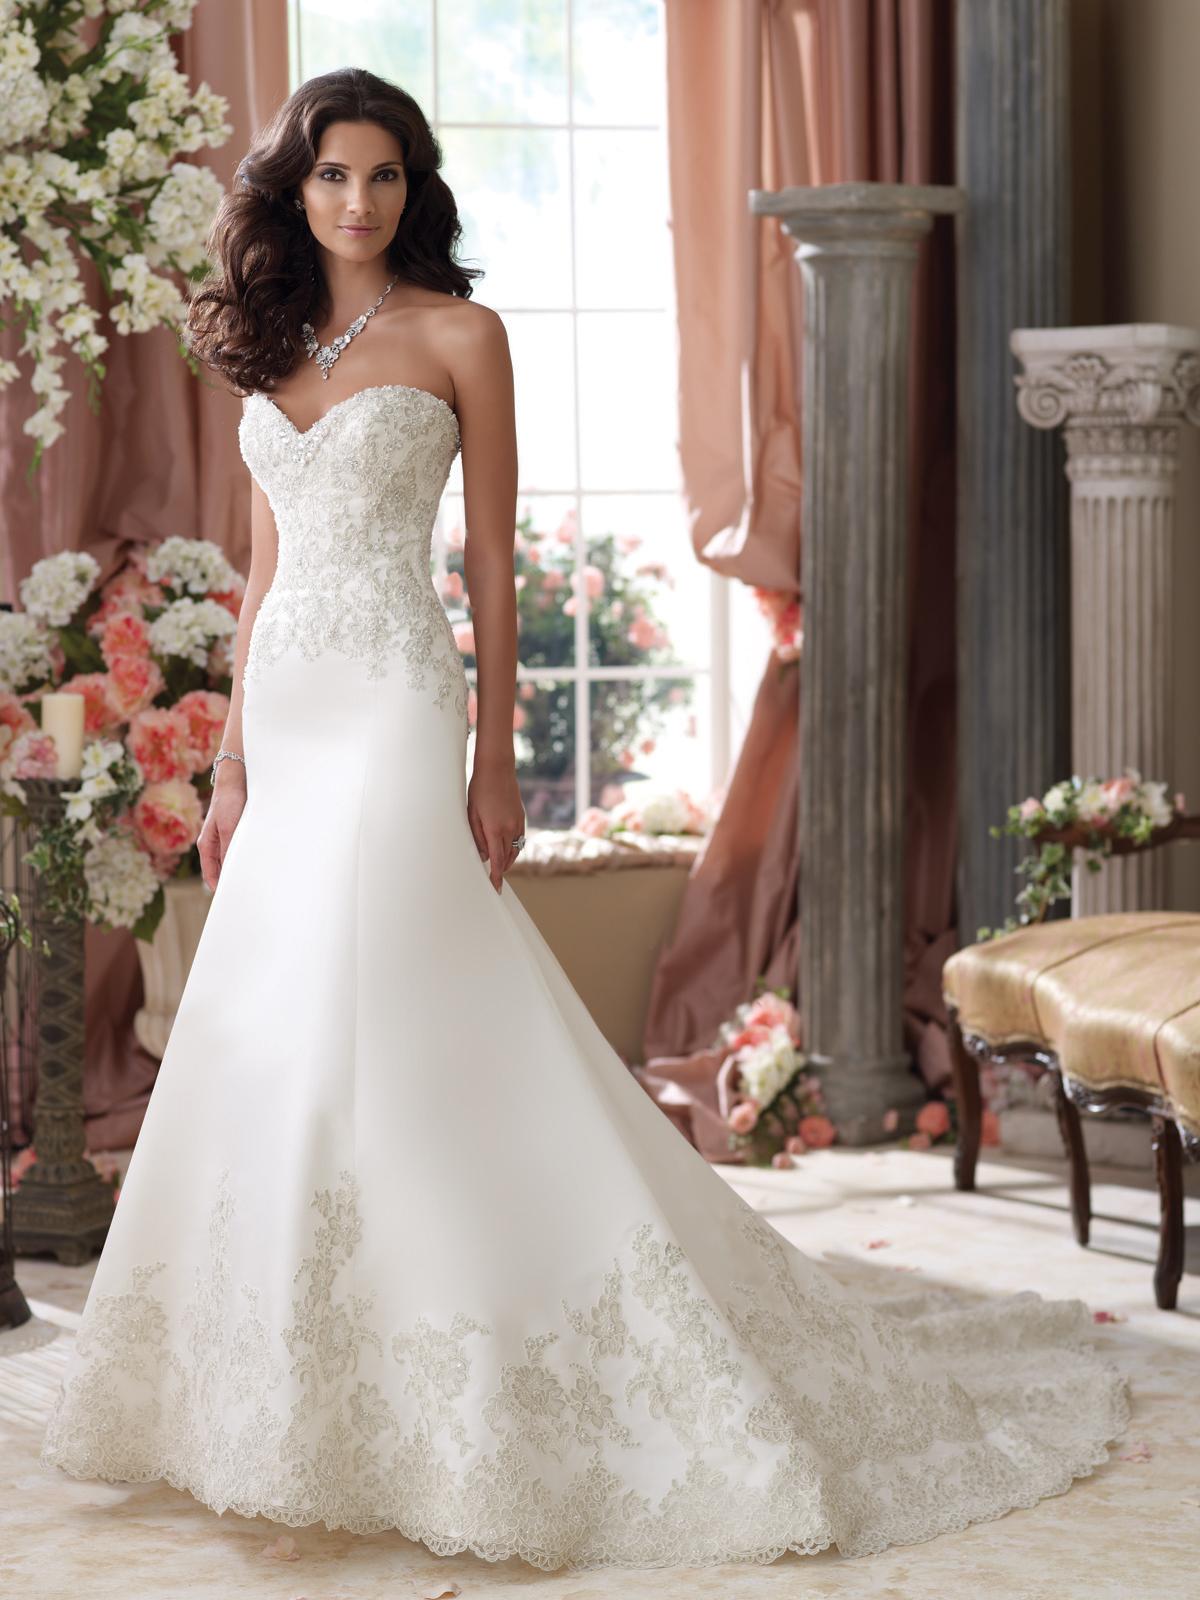 Wedding Dresses For   Sunshine Coast : Home mon cheri by david tutera isidore